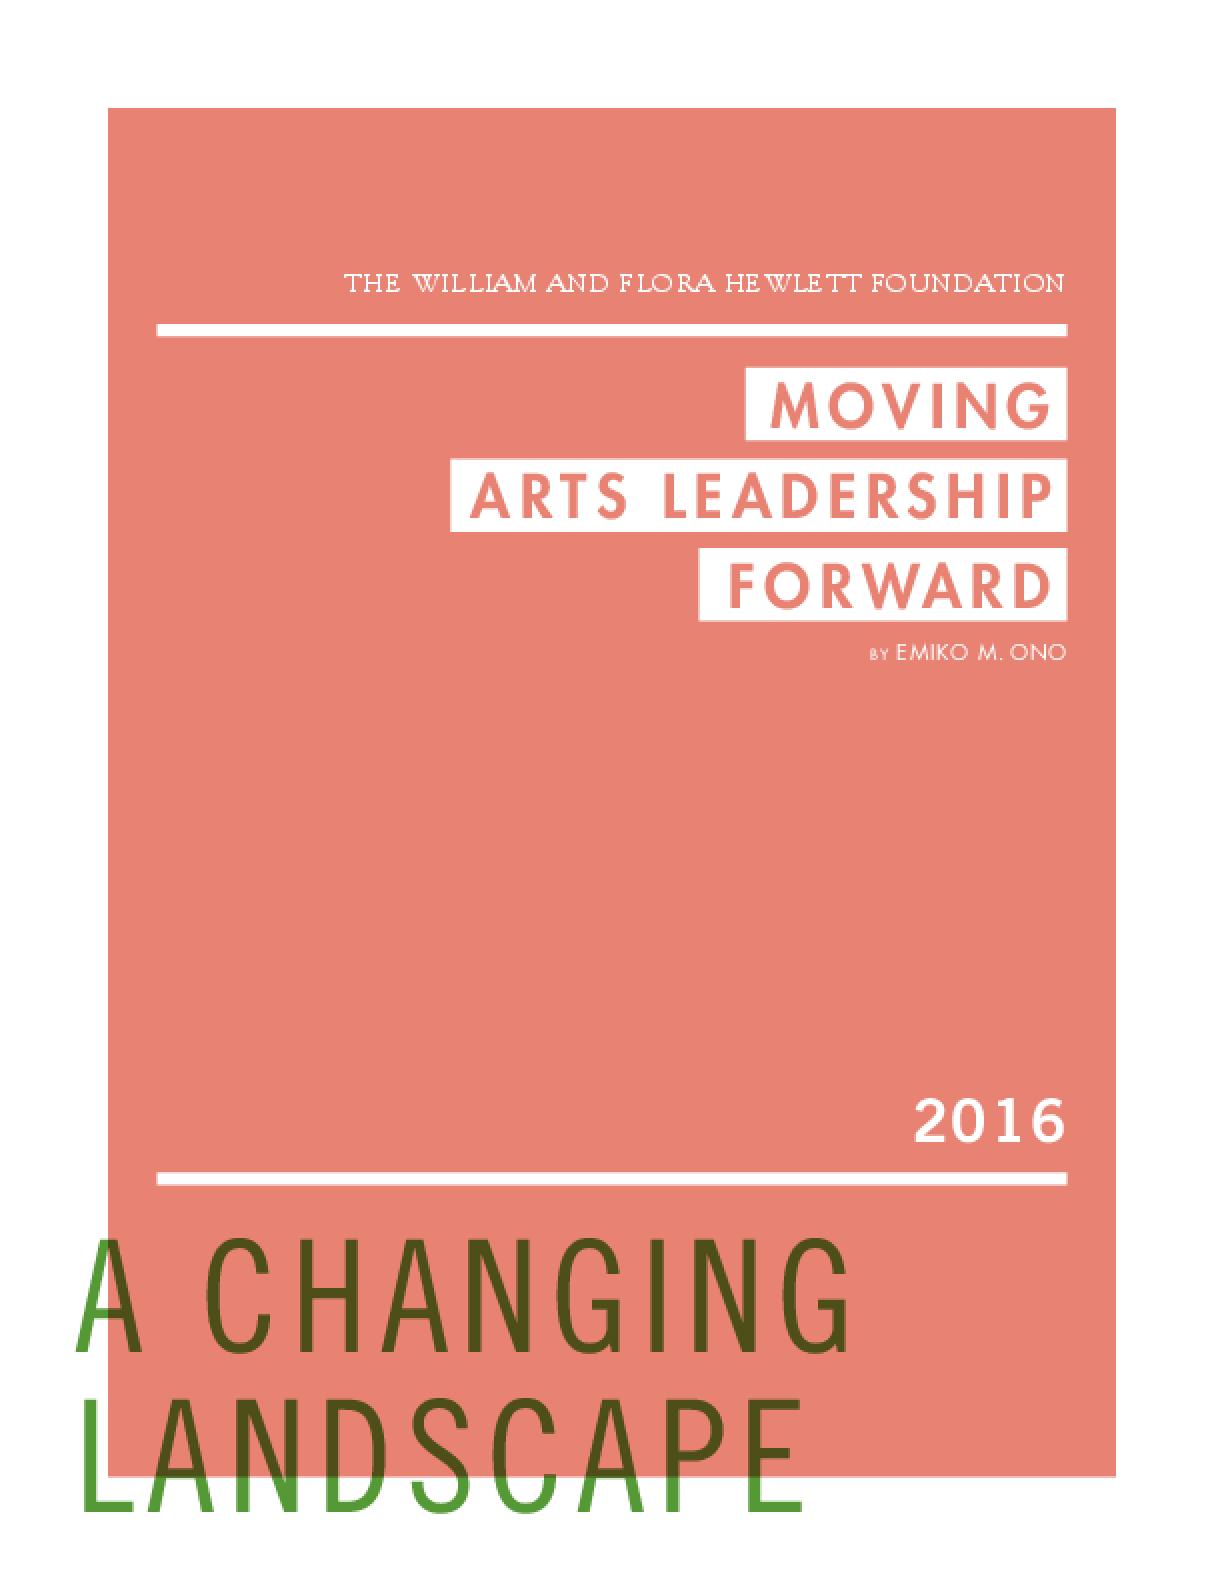 Moving Arts Leadership Forward: A Changing Landscape